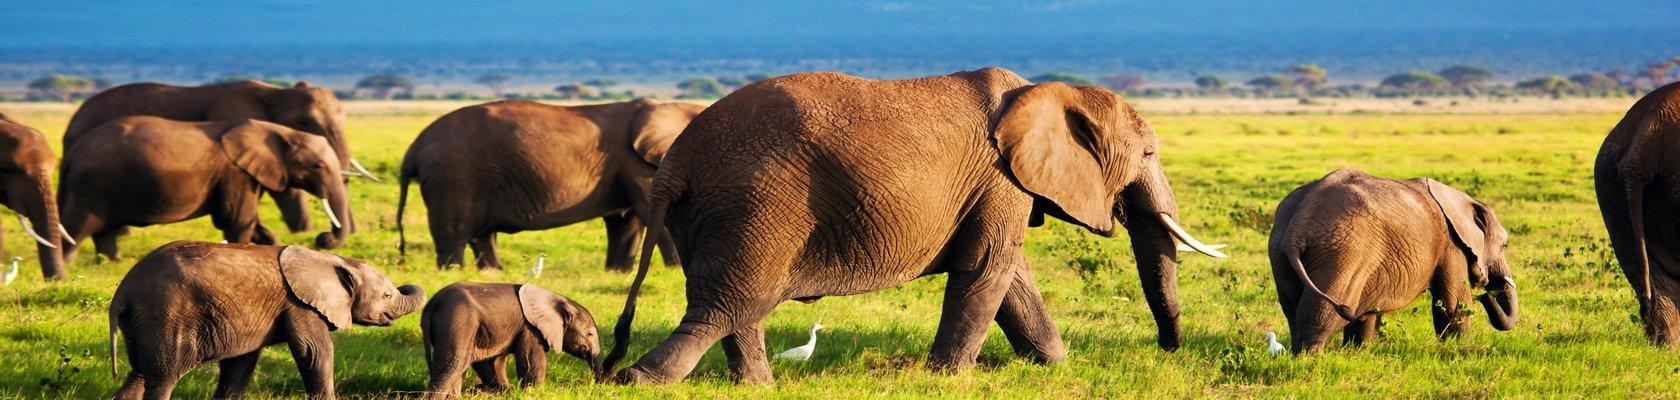 Op safari in Chobe Nationaal Park